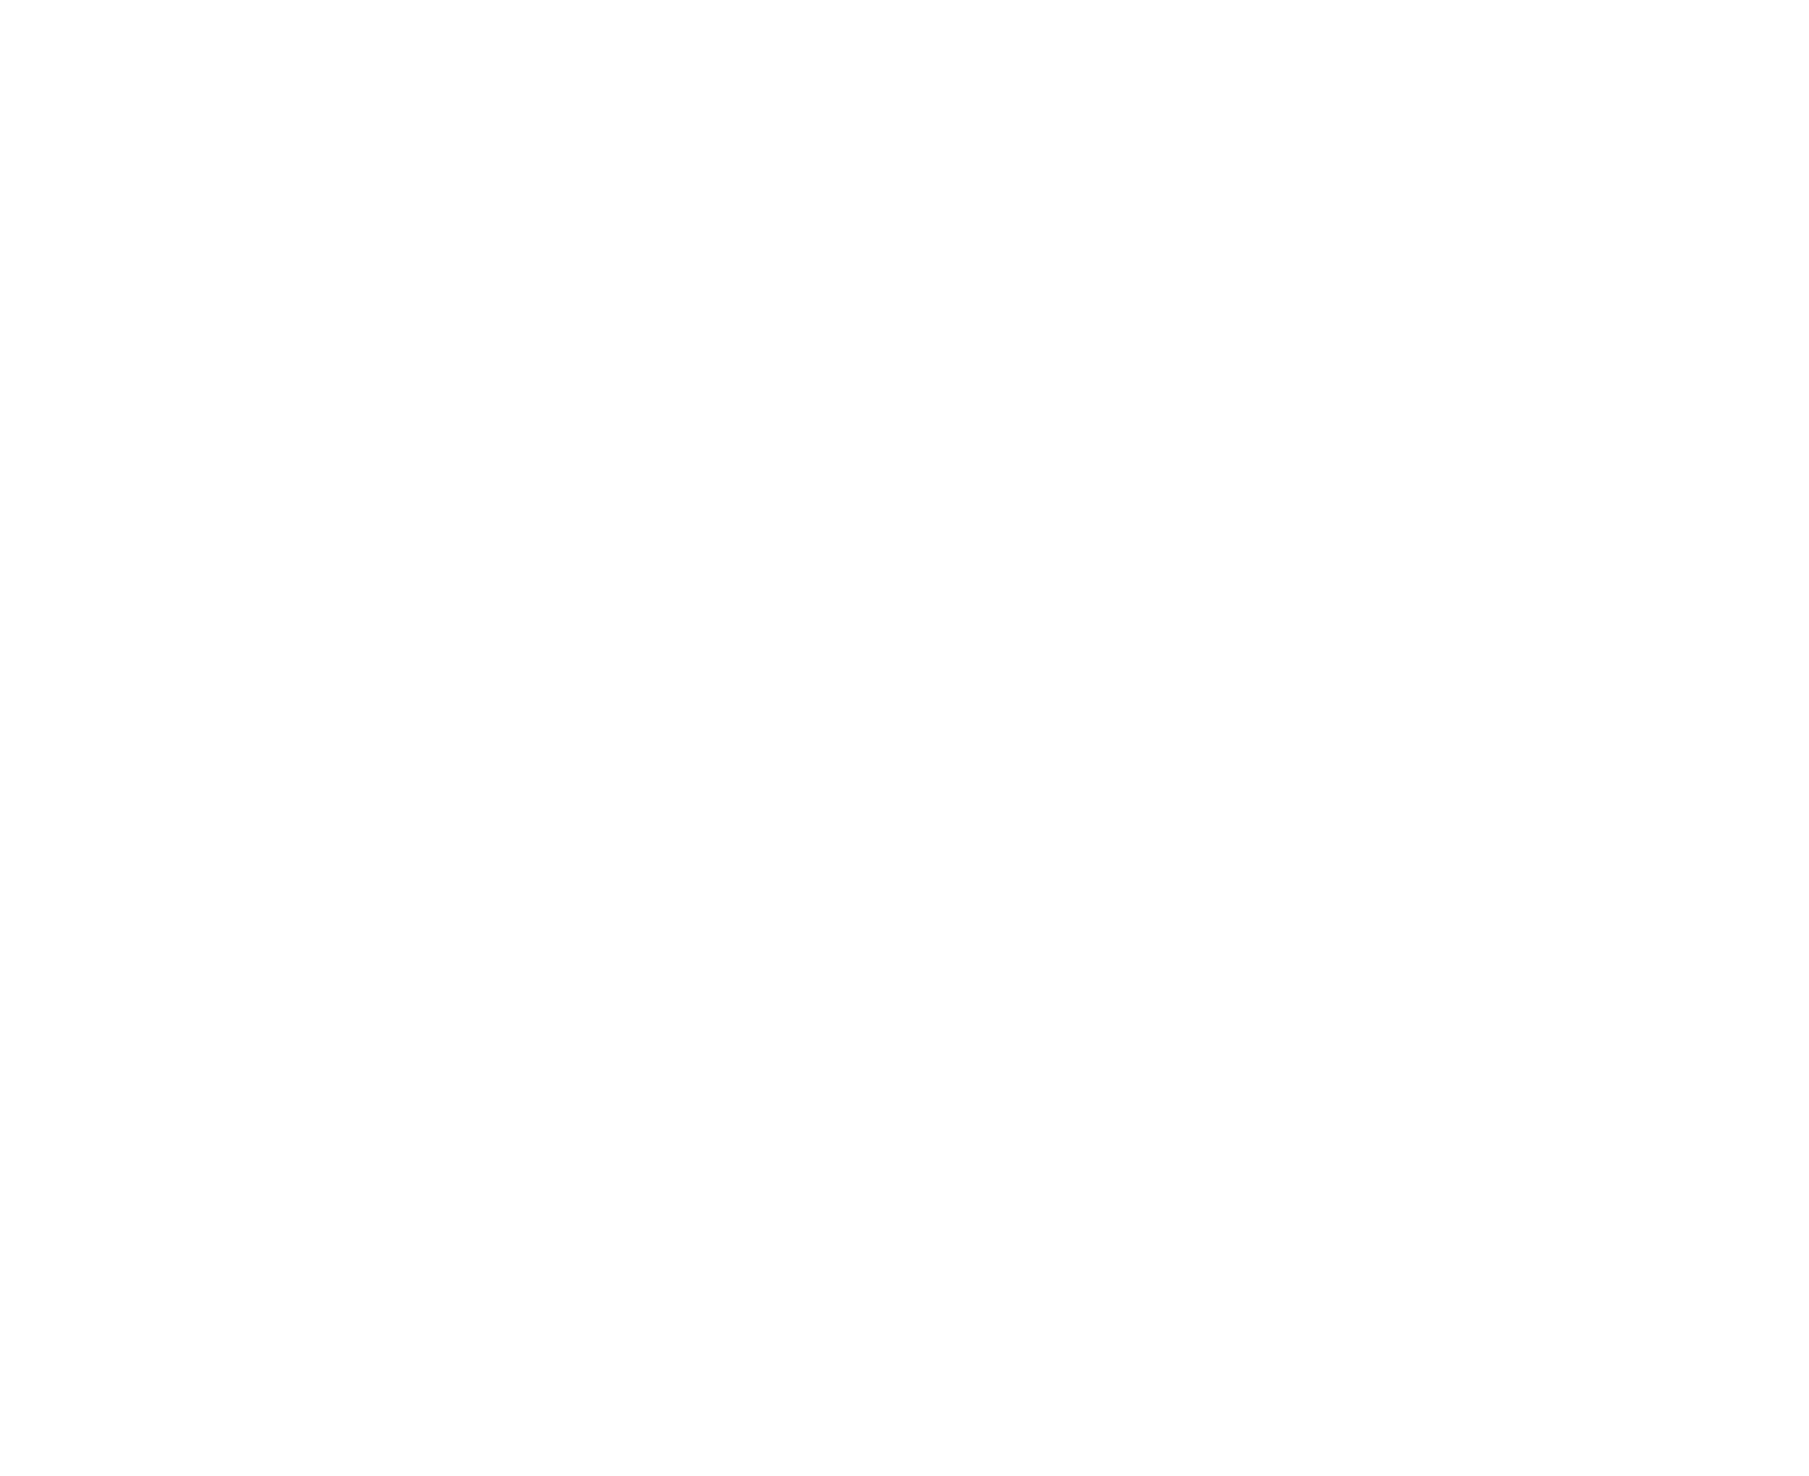 www.erbo1.cz